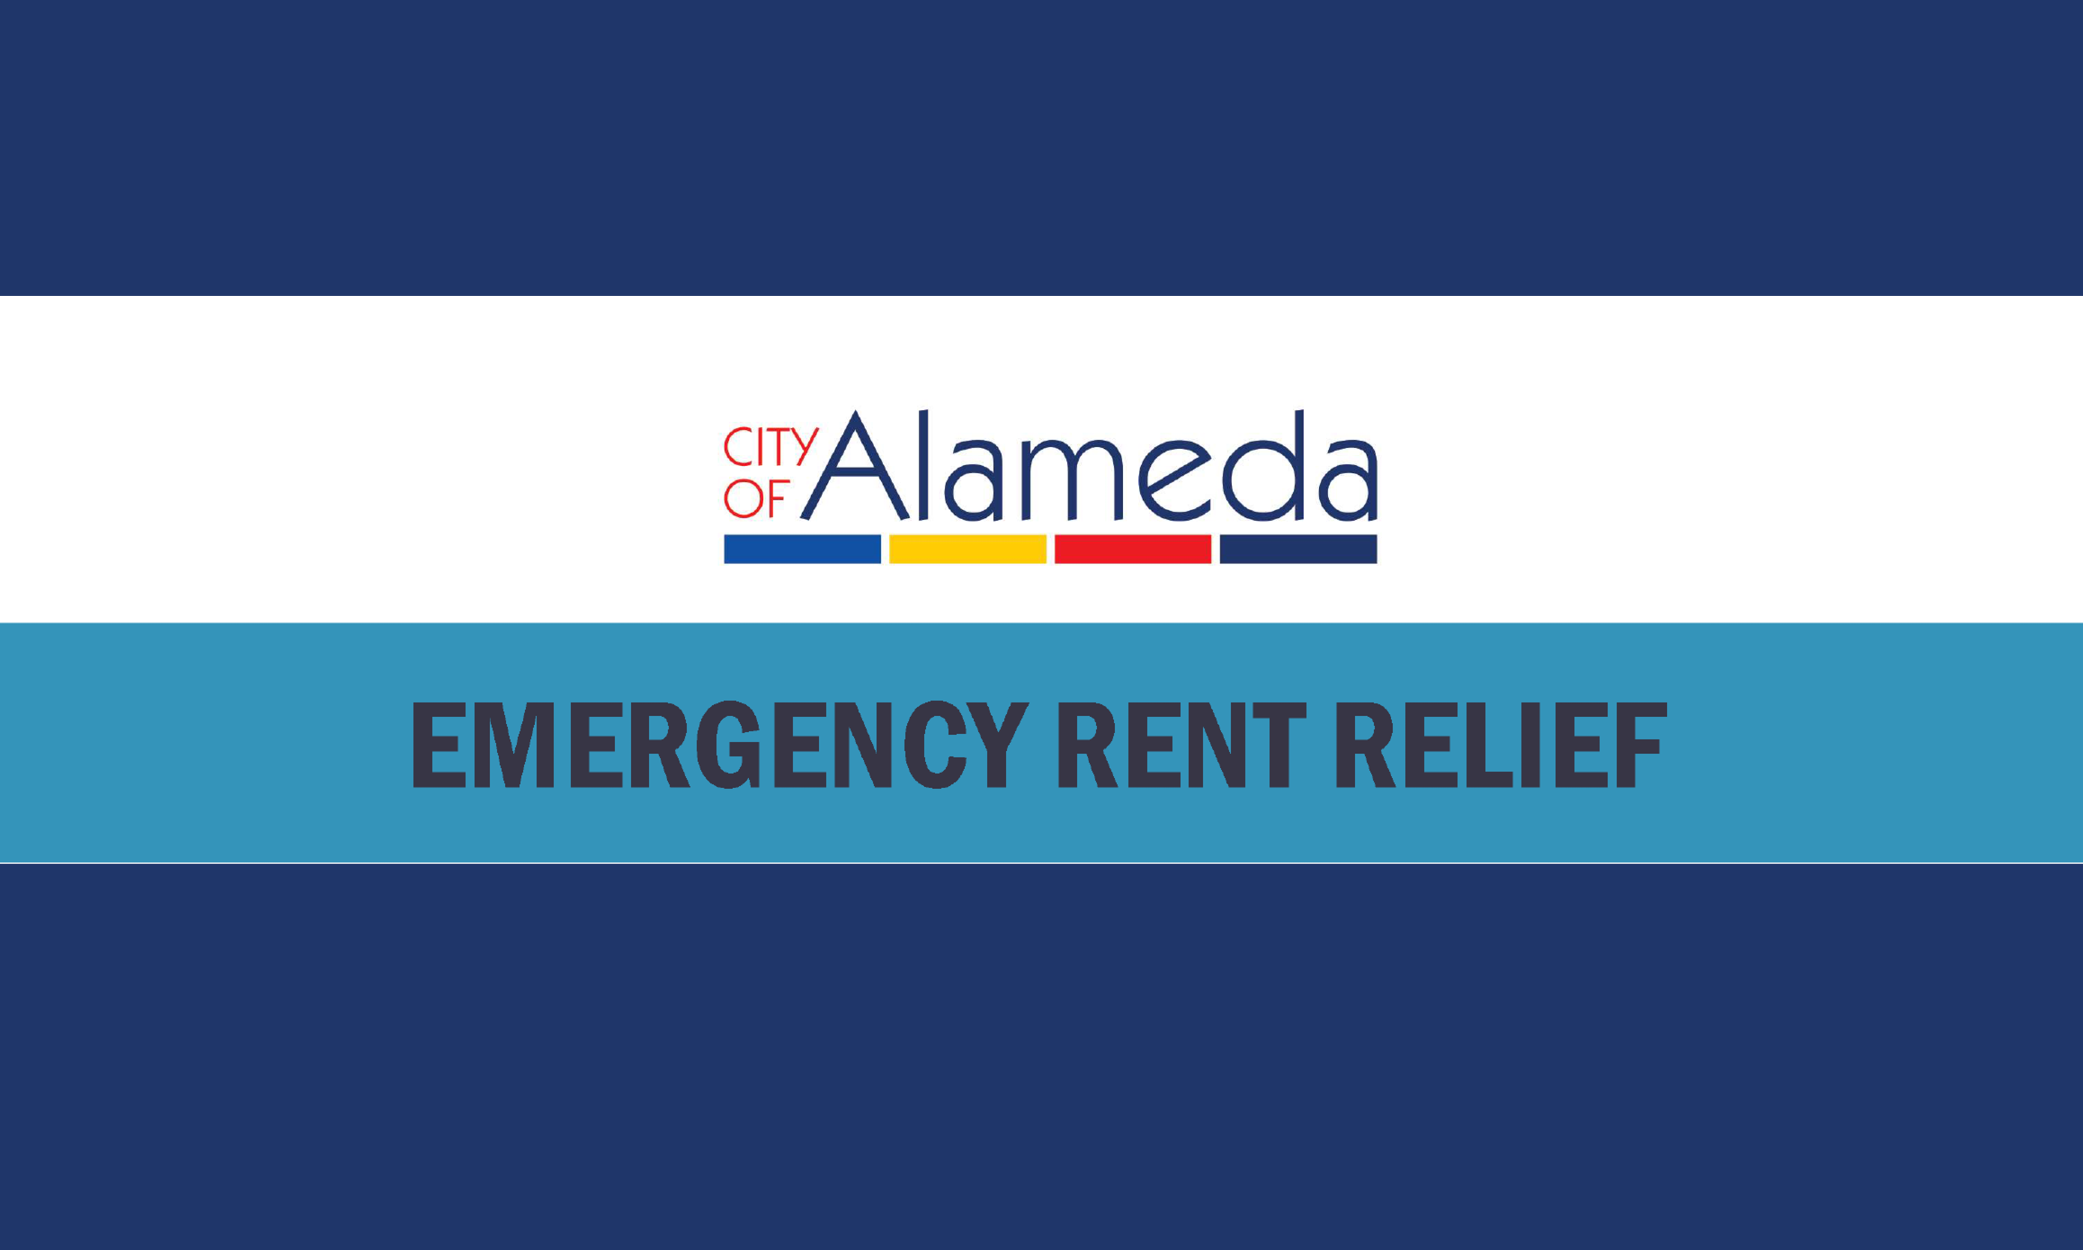 City of Alameda Emergency Rent Relief